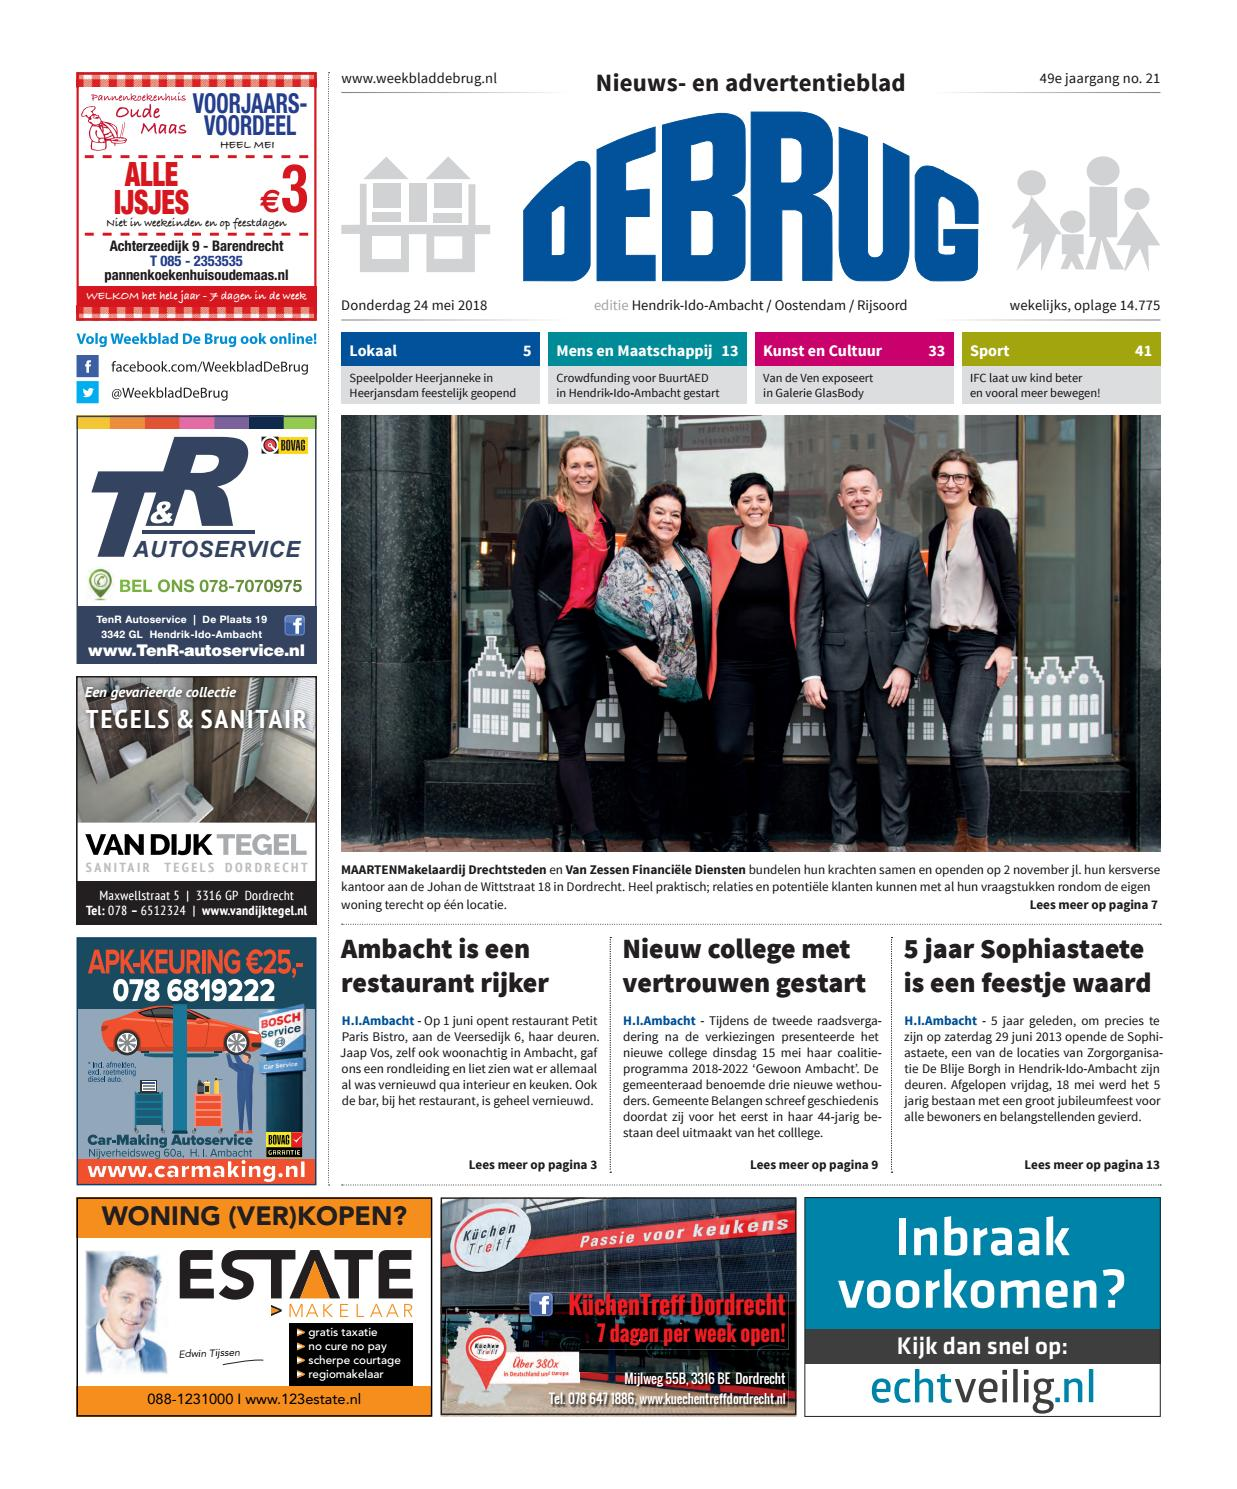 Lars Tv Meubel Karwei.Weekblad De Brug Week 21 2018 Editie Hendrik Ido Ambacht By